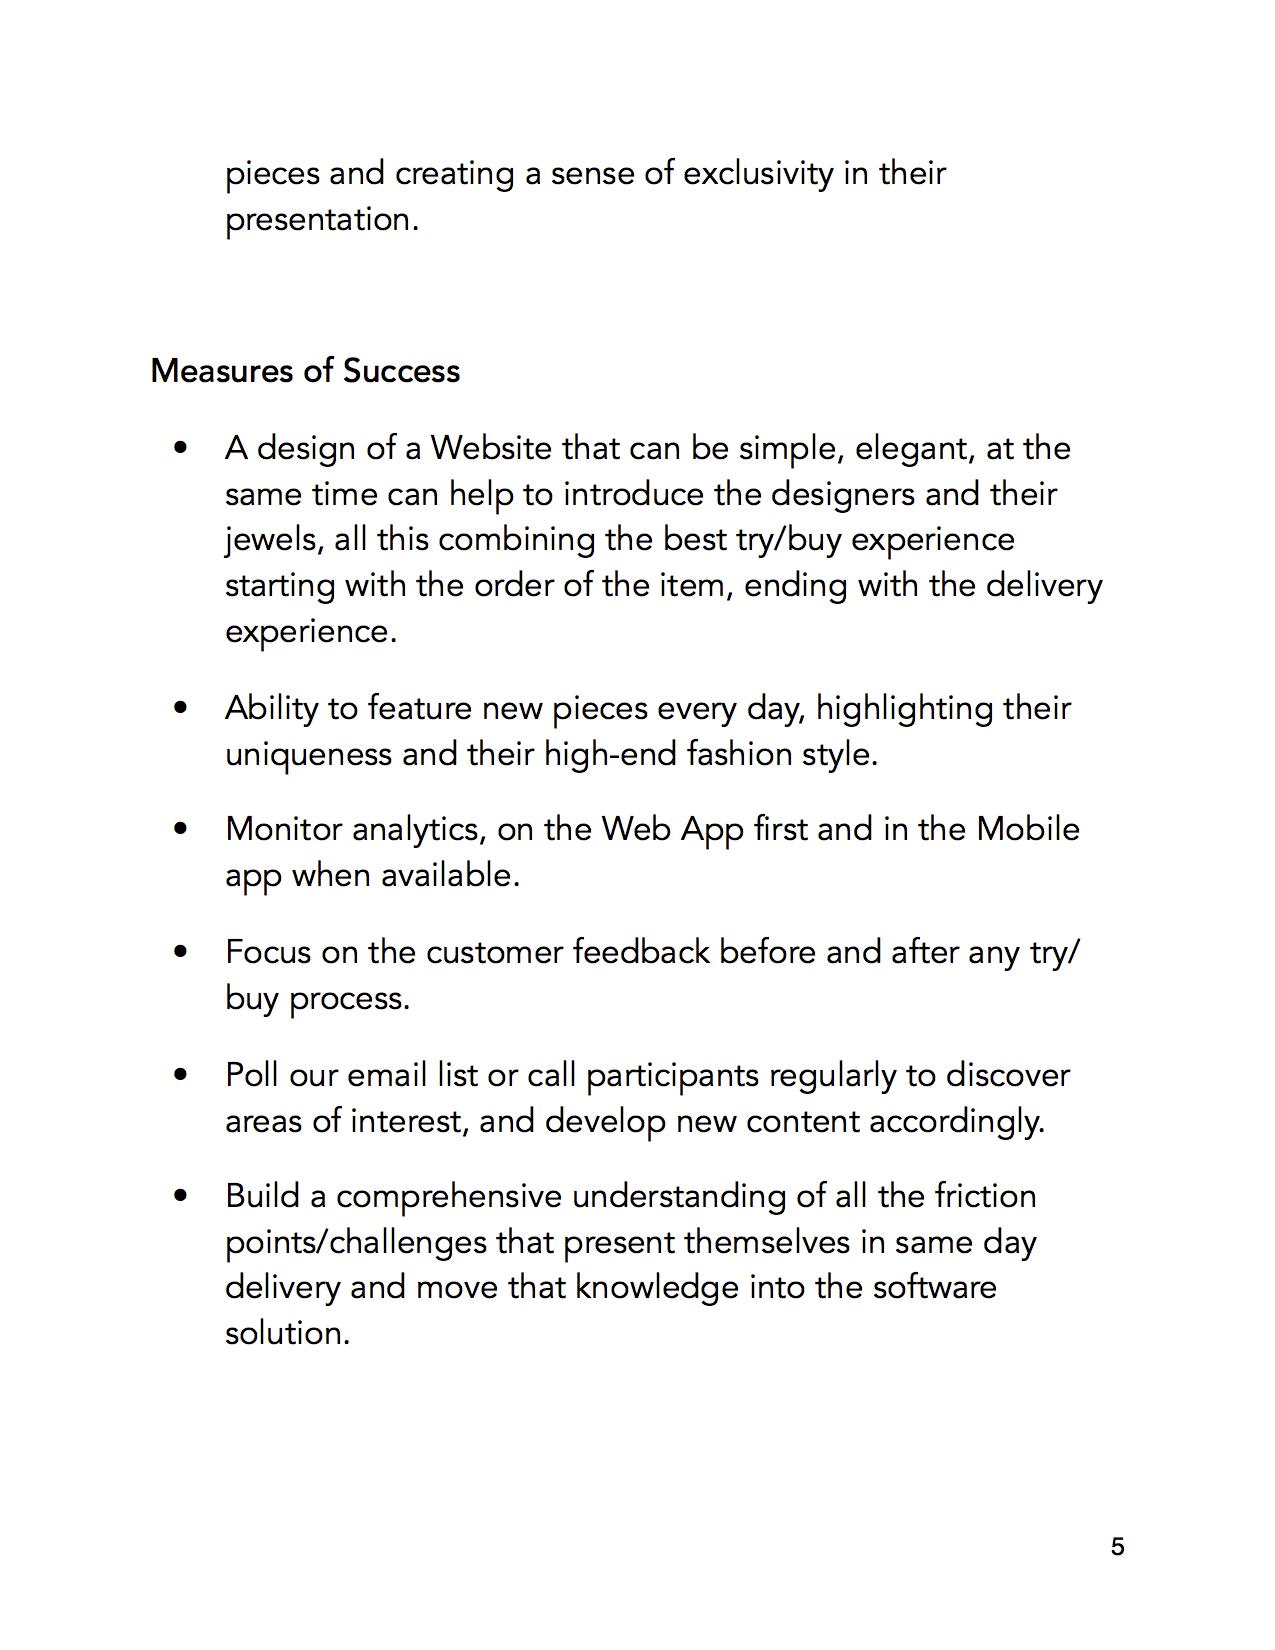 Strategic Brief 5.jpg